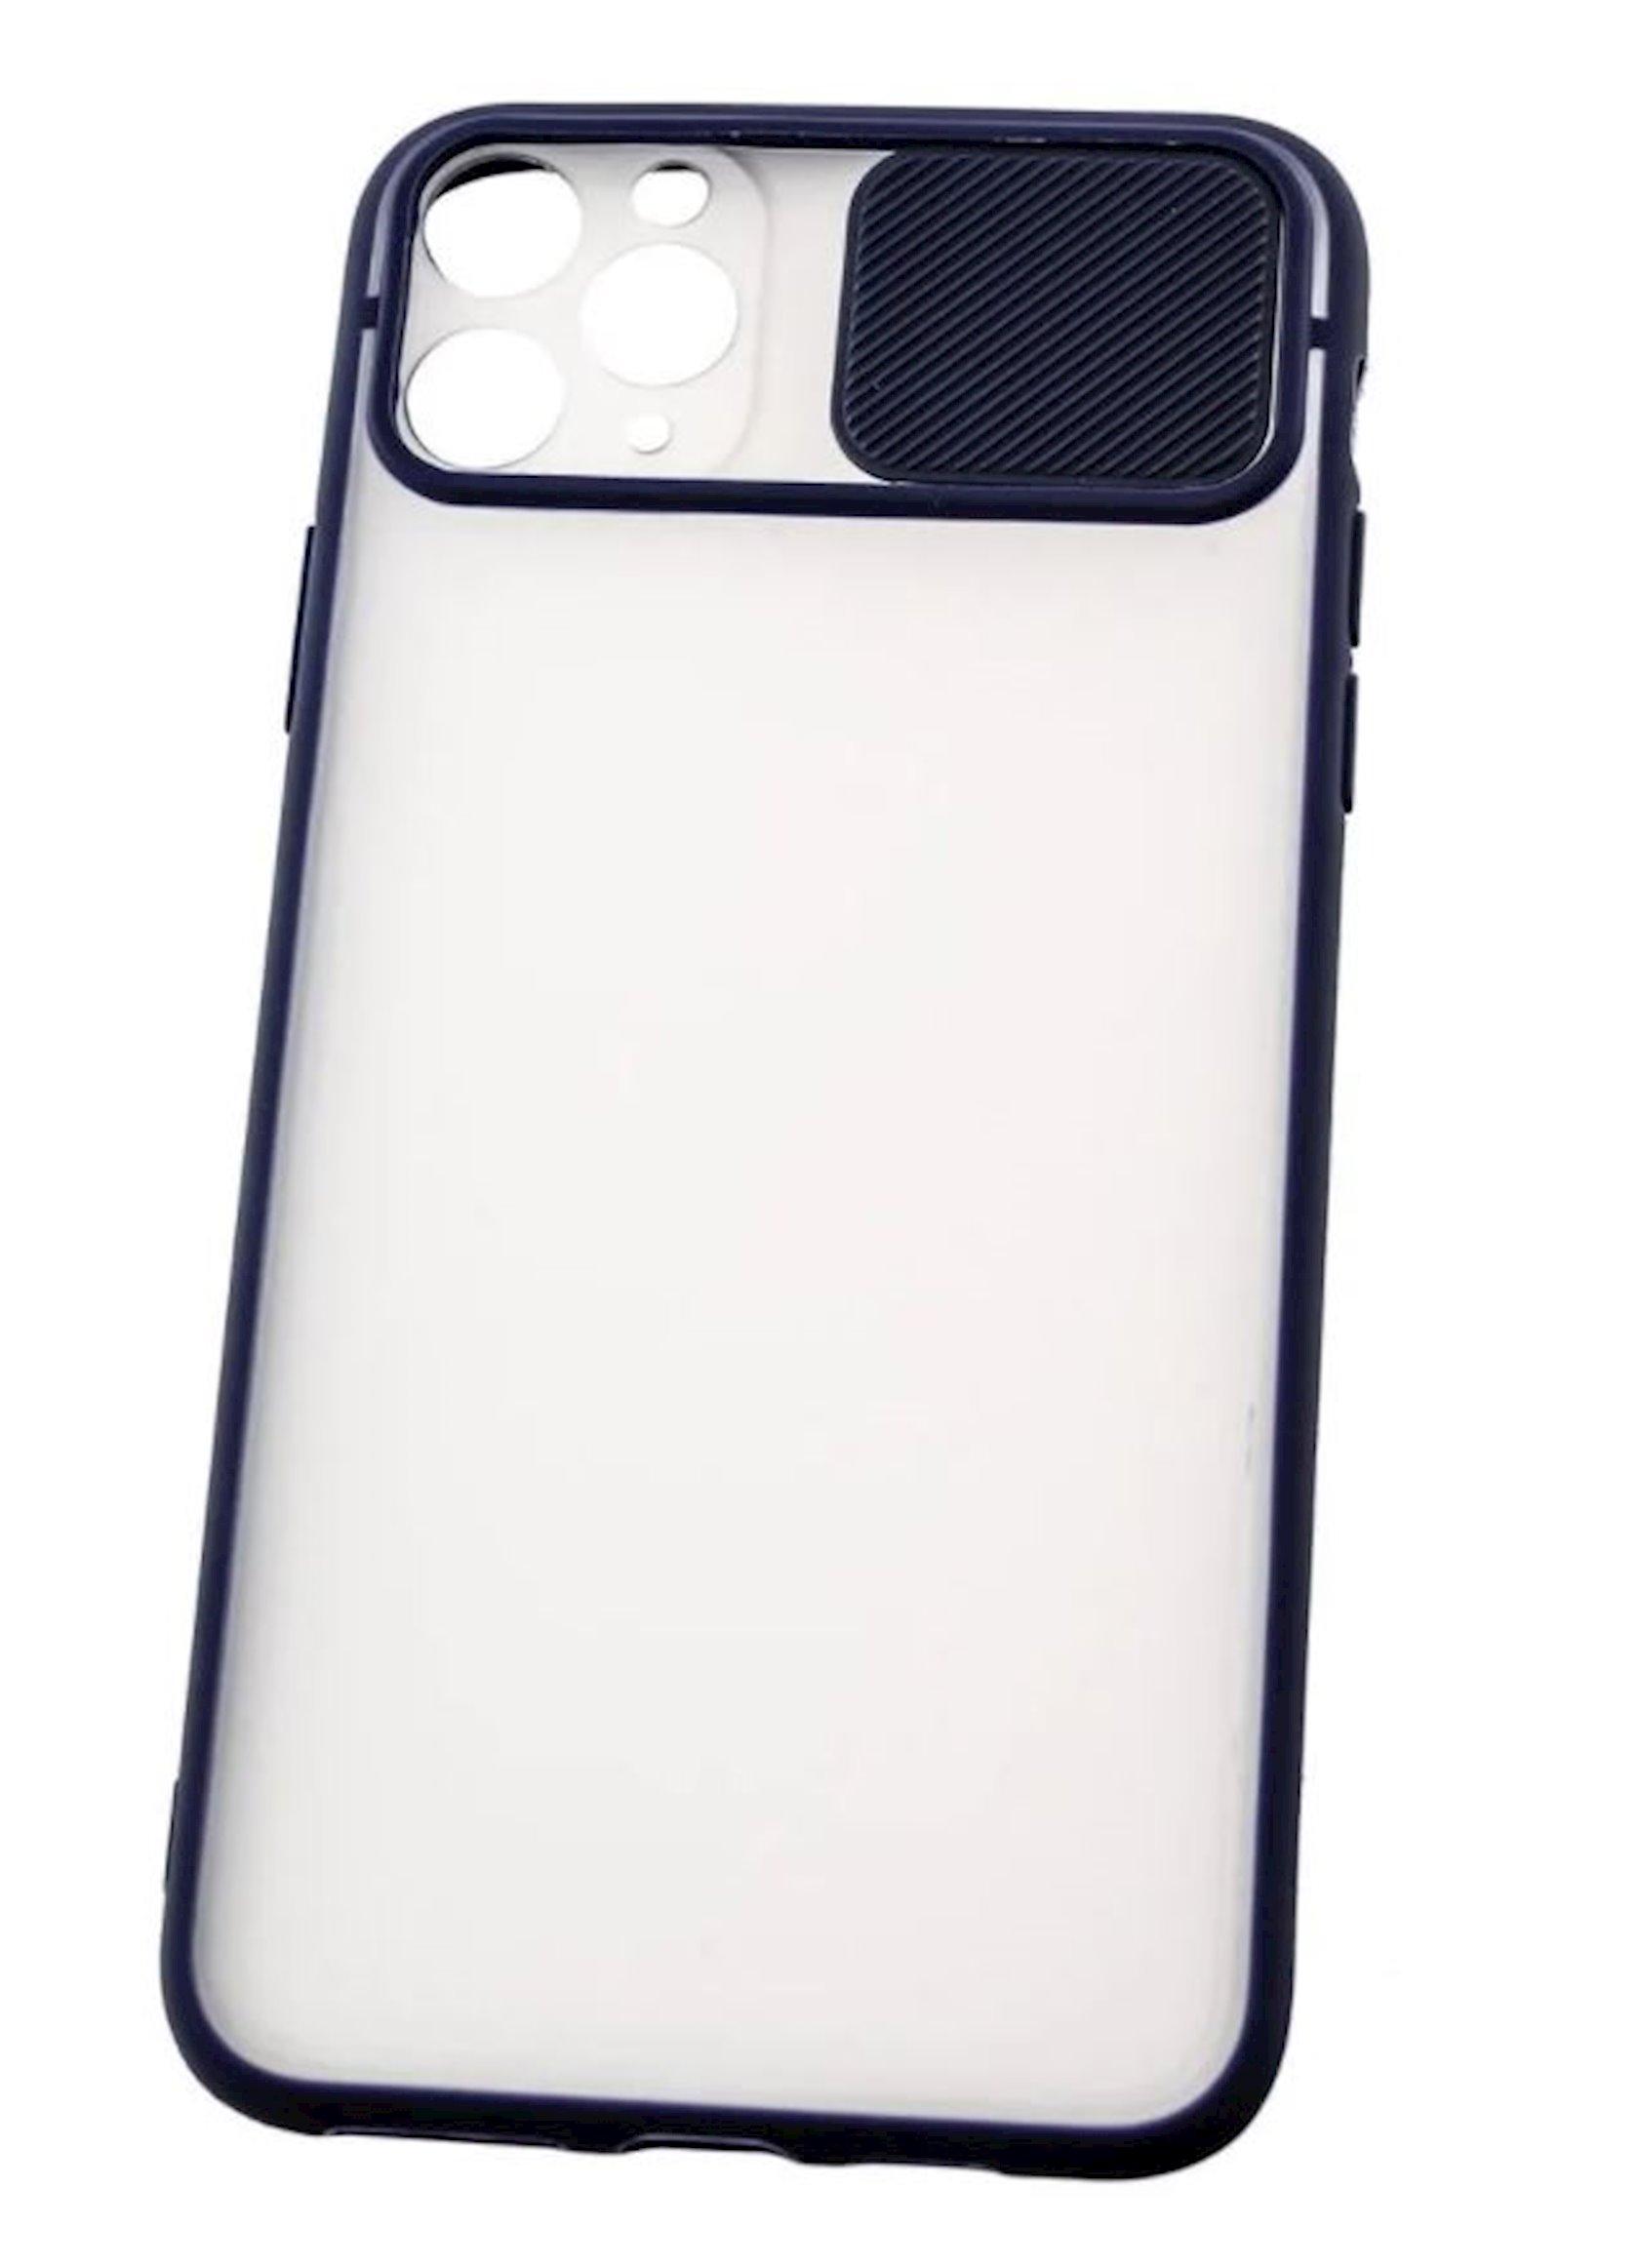 Çexol YO Camshield Color Apple iPhone 11 Pro Max üçün Blue